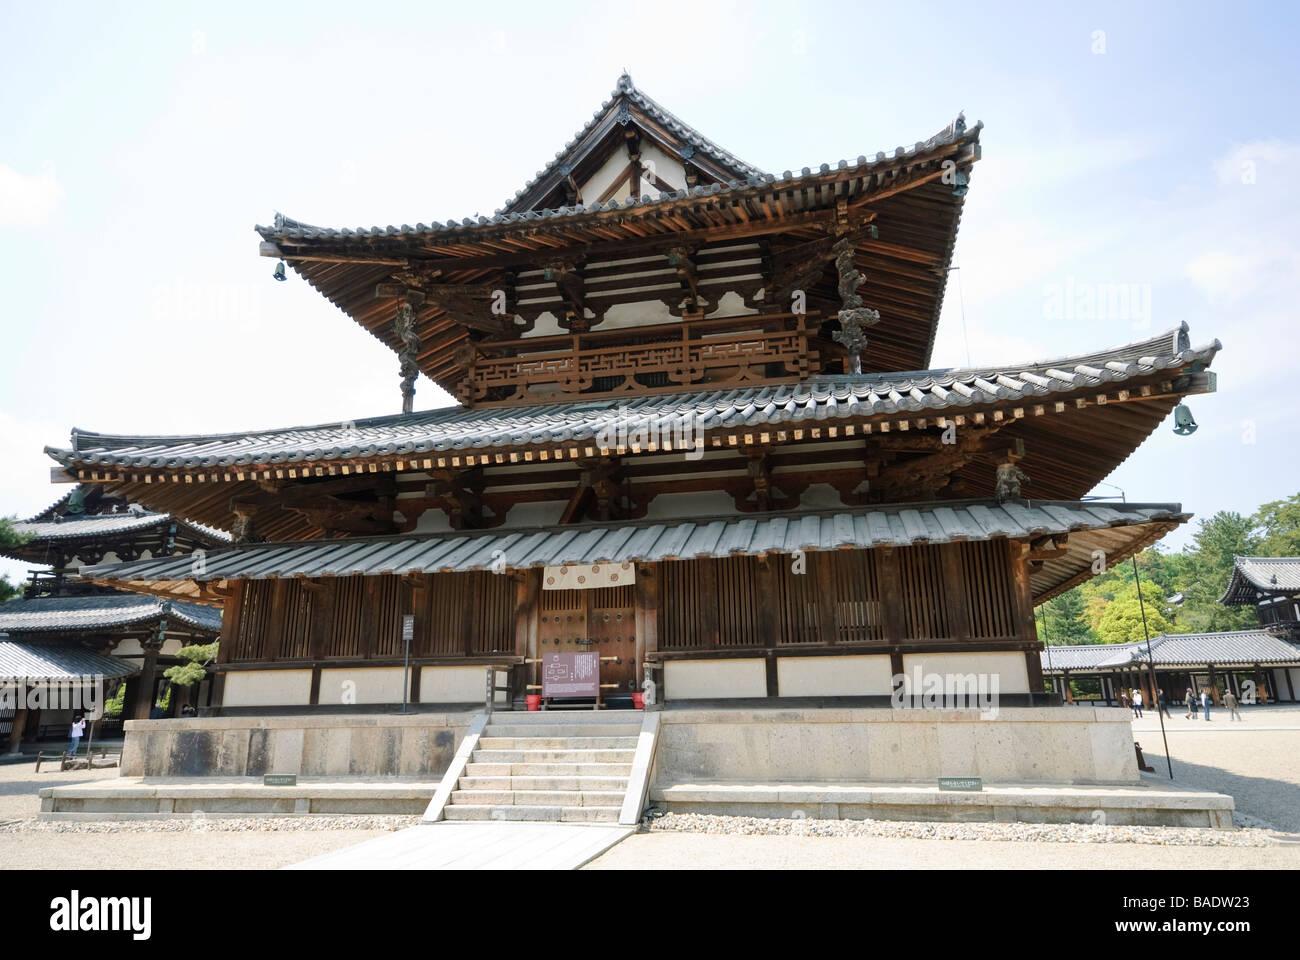 The Kondo (main hall) of the Sai-in part of Horyu-ji temple. Nara Prefecture, Japan. Stock Photo